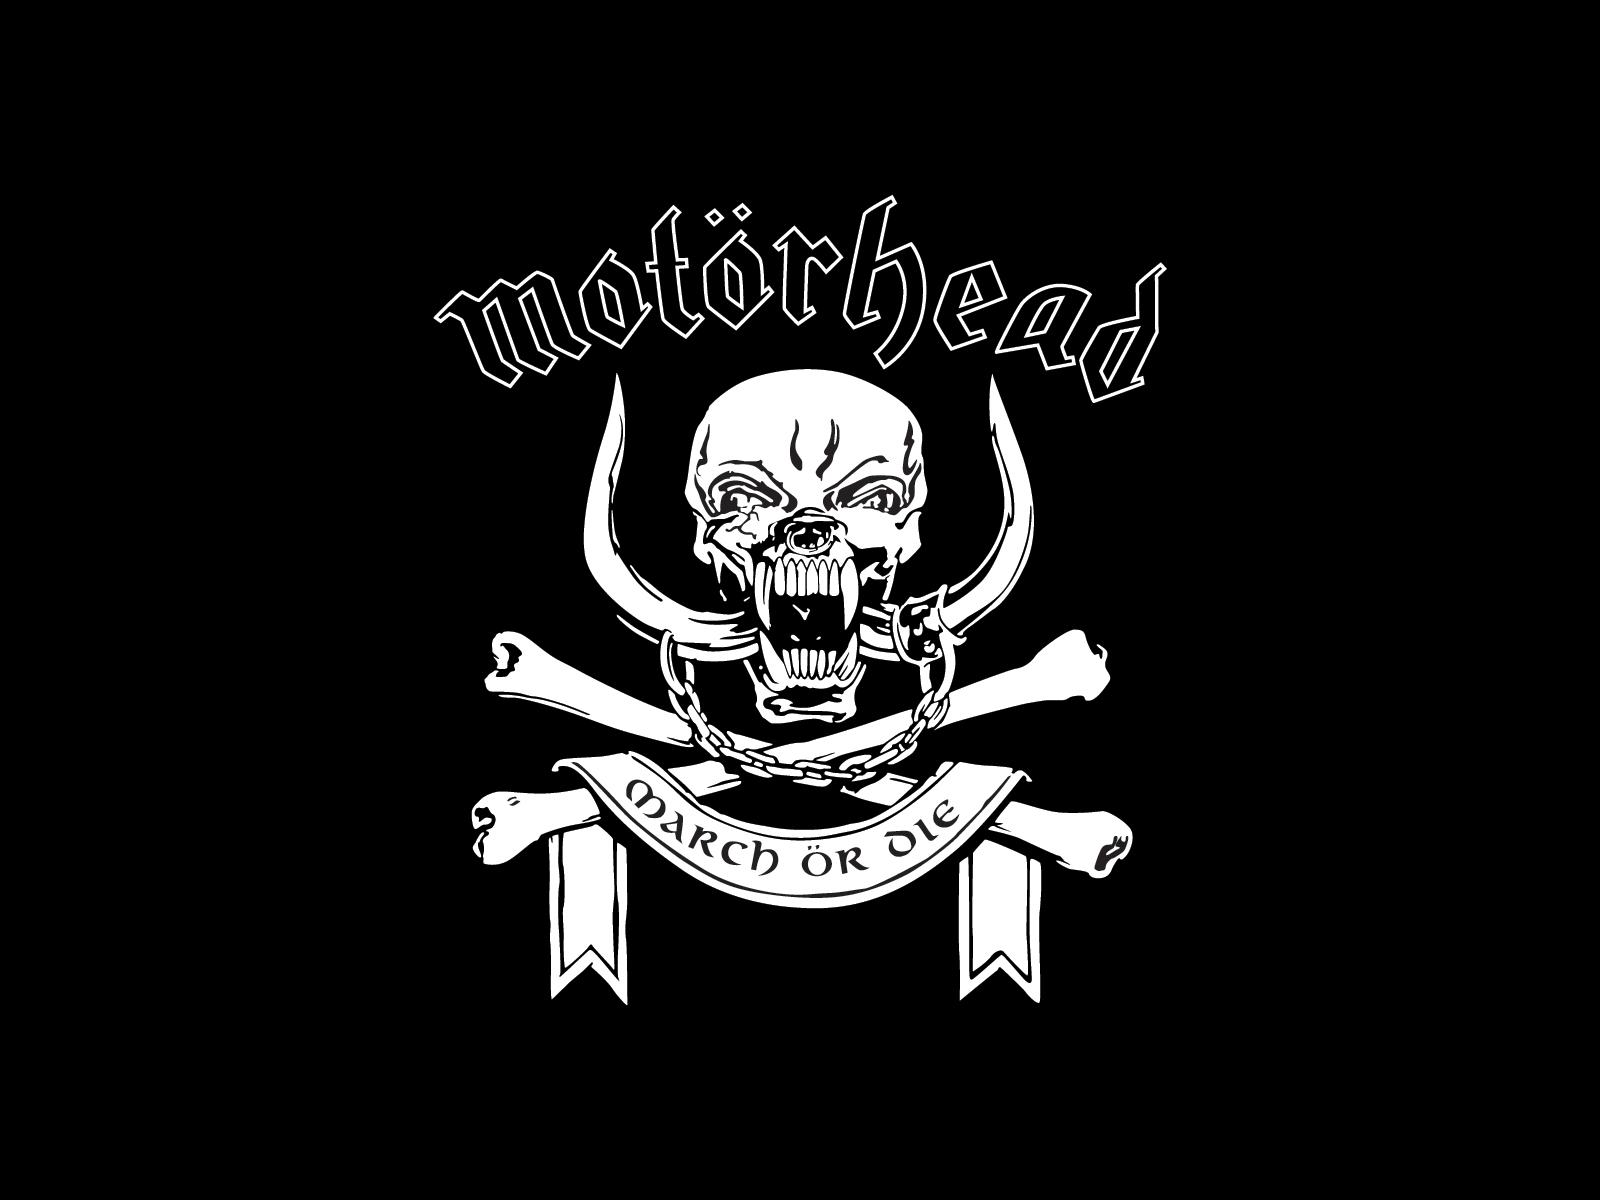 Motorhead wallpaper Wallpaper of metal band Motorhead 1600x1200